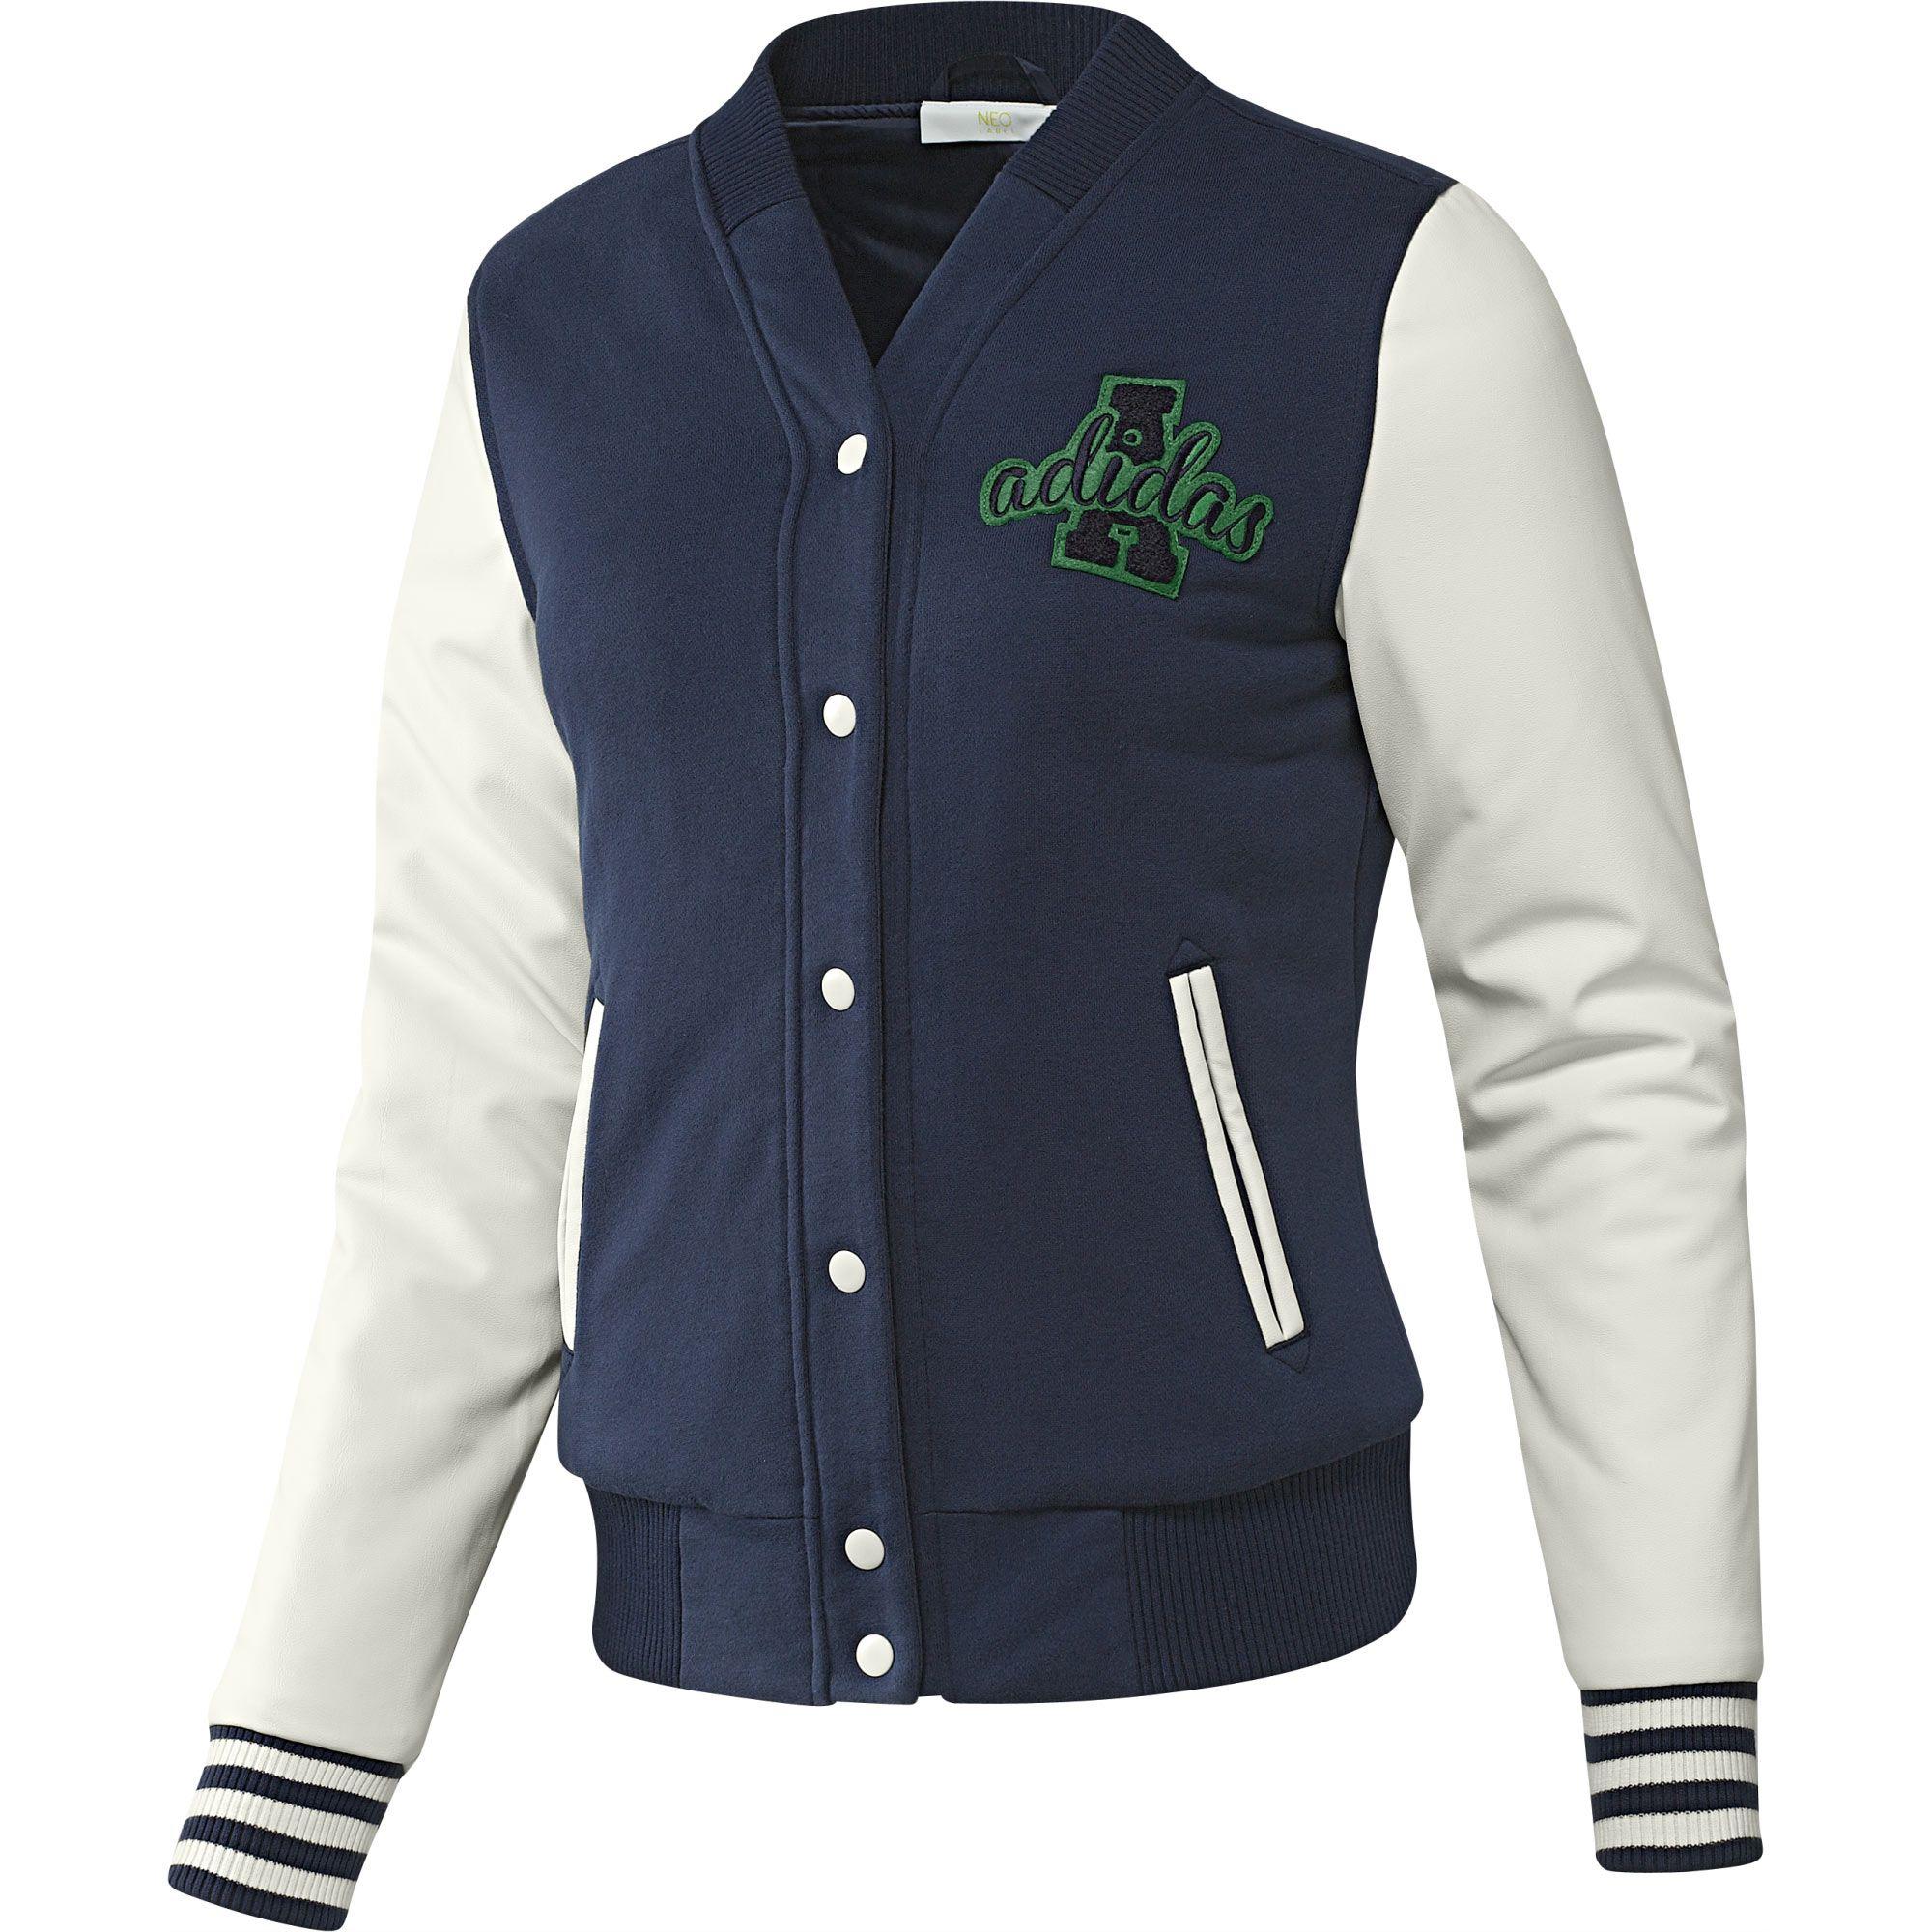 Adidas Style Veste Collegebaseball Et Sports College xww0Yp